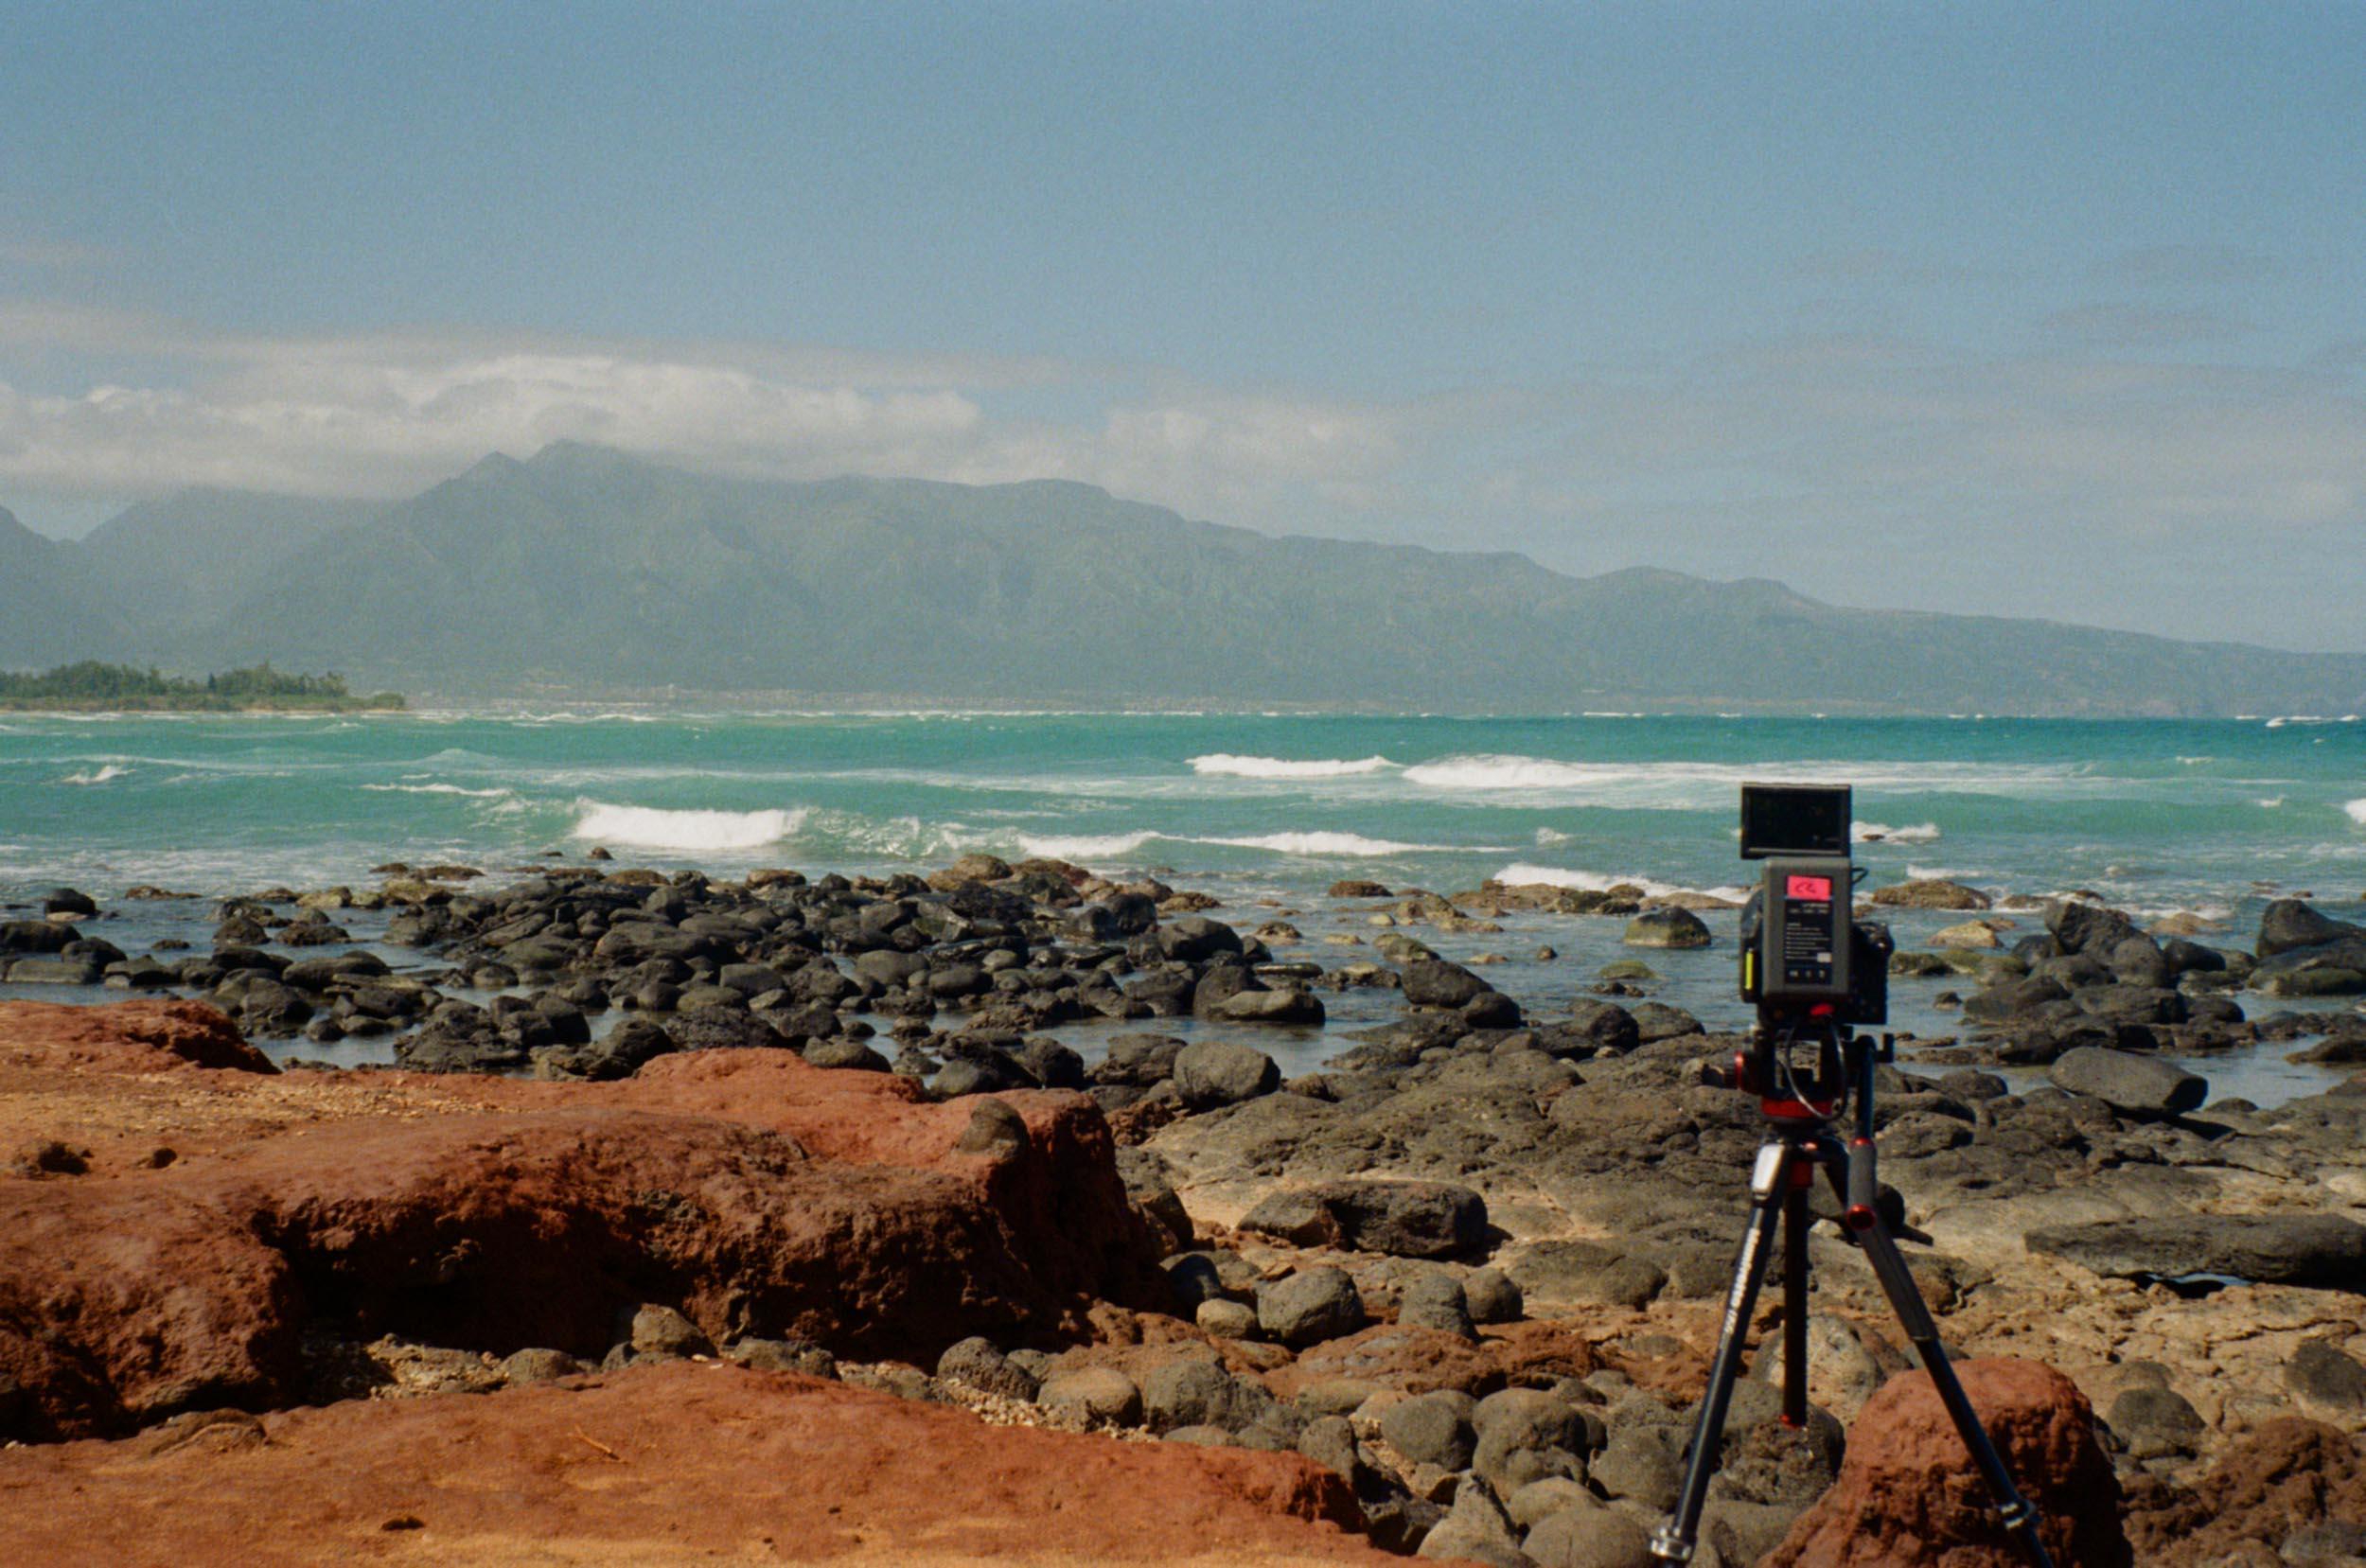 35mm_Maui-2.jpg